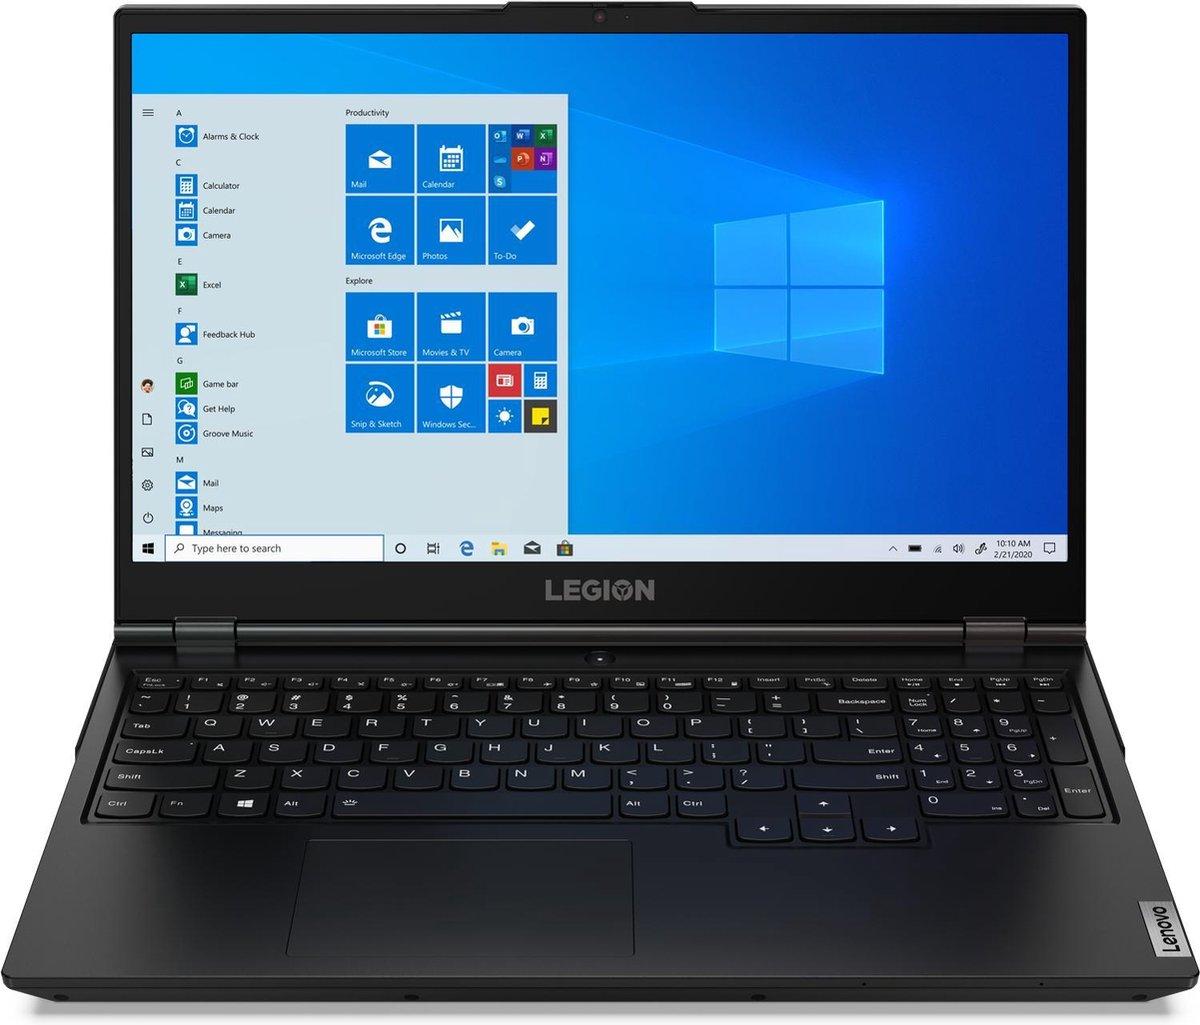 Lenovo Legion 5 82GN003UMH - Gaming Laptop - 17.3 Inch